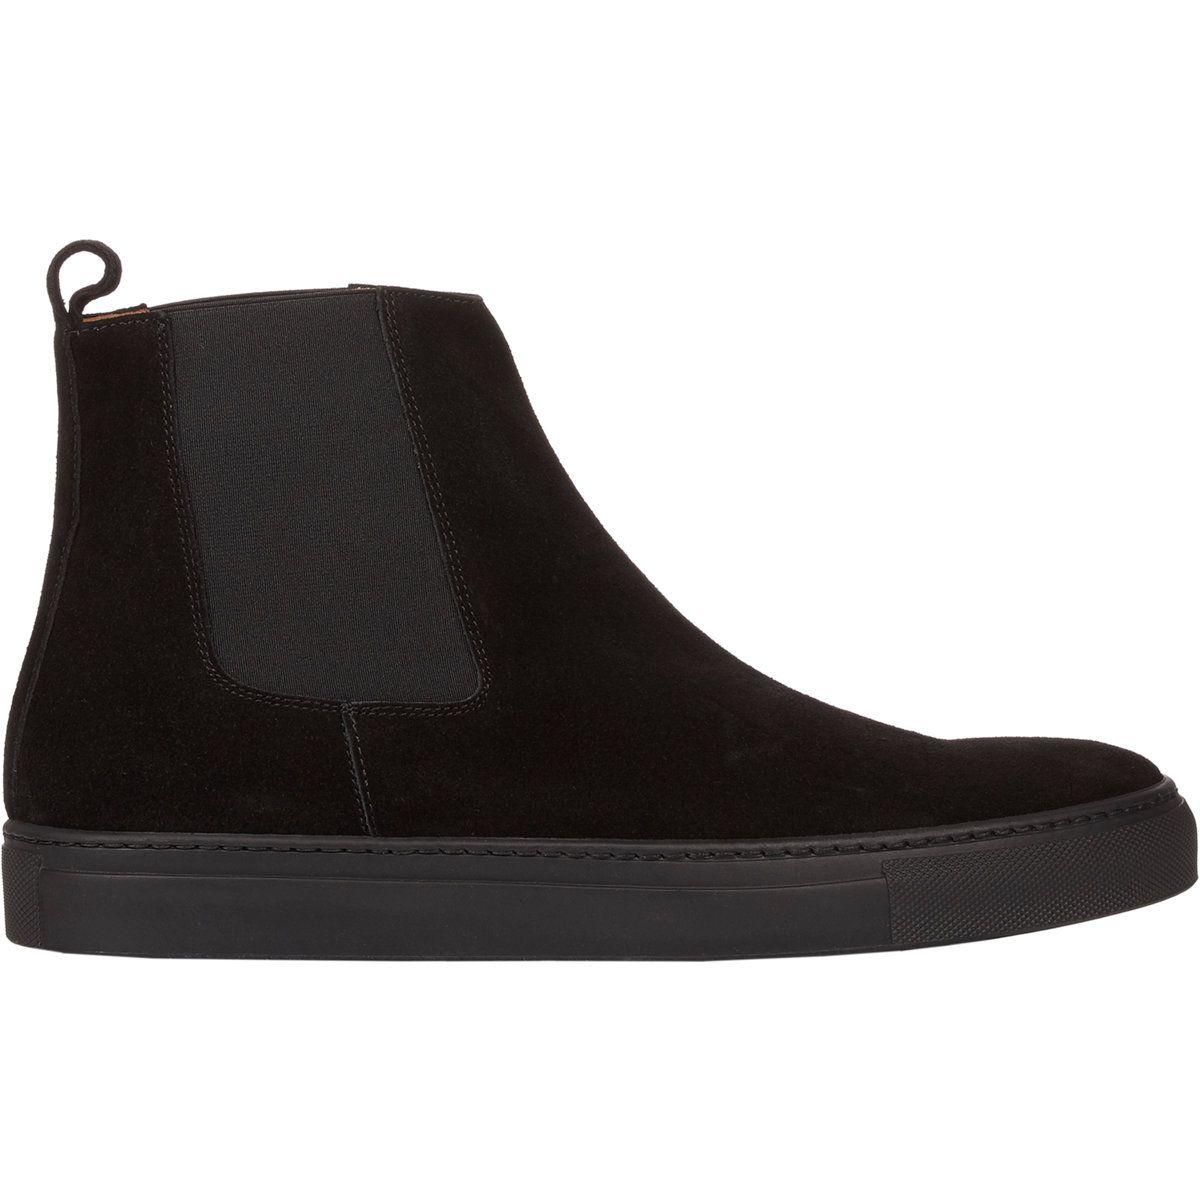 0001f14b275ea Men's Black Chelsea Sneakers | SNEAKERS | Barneys new york, Chelsea ...